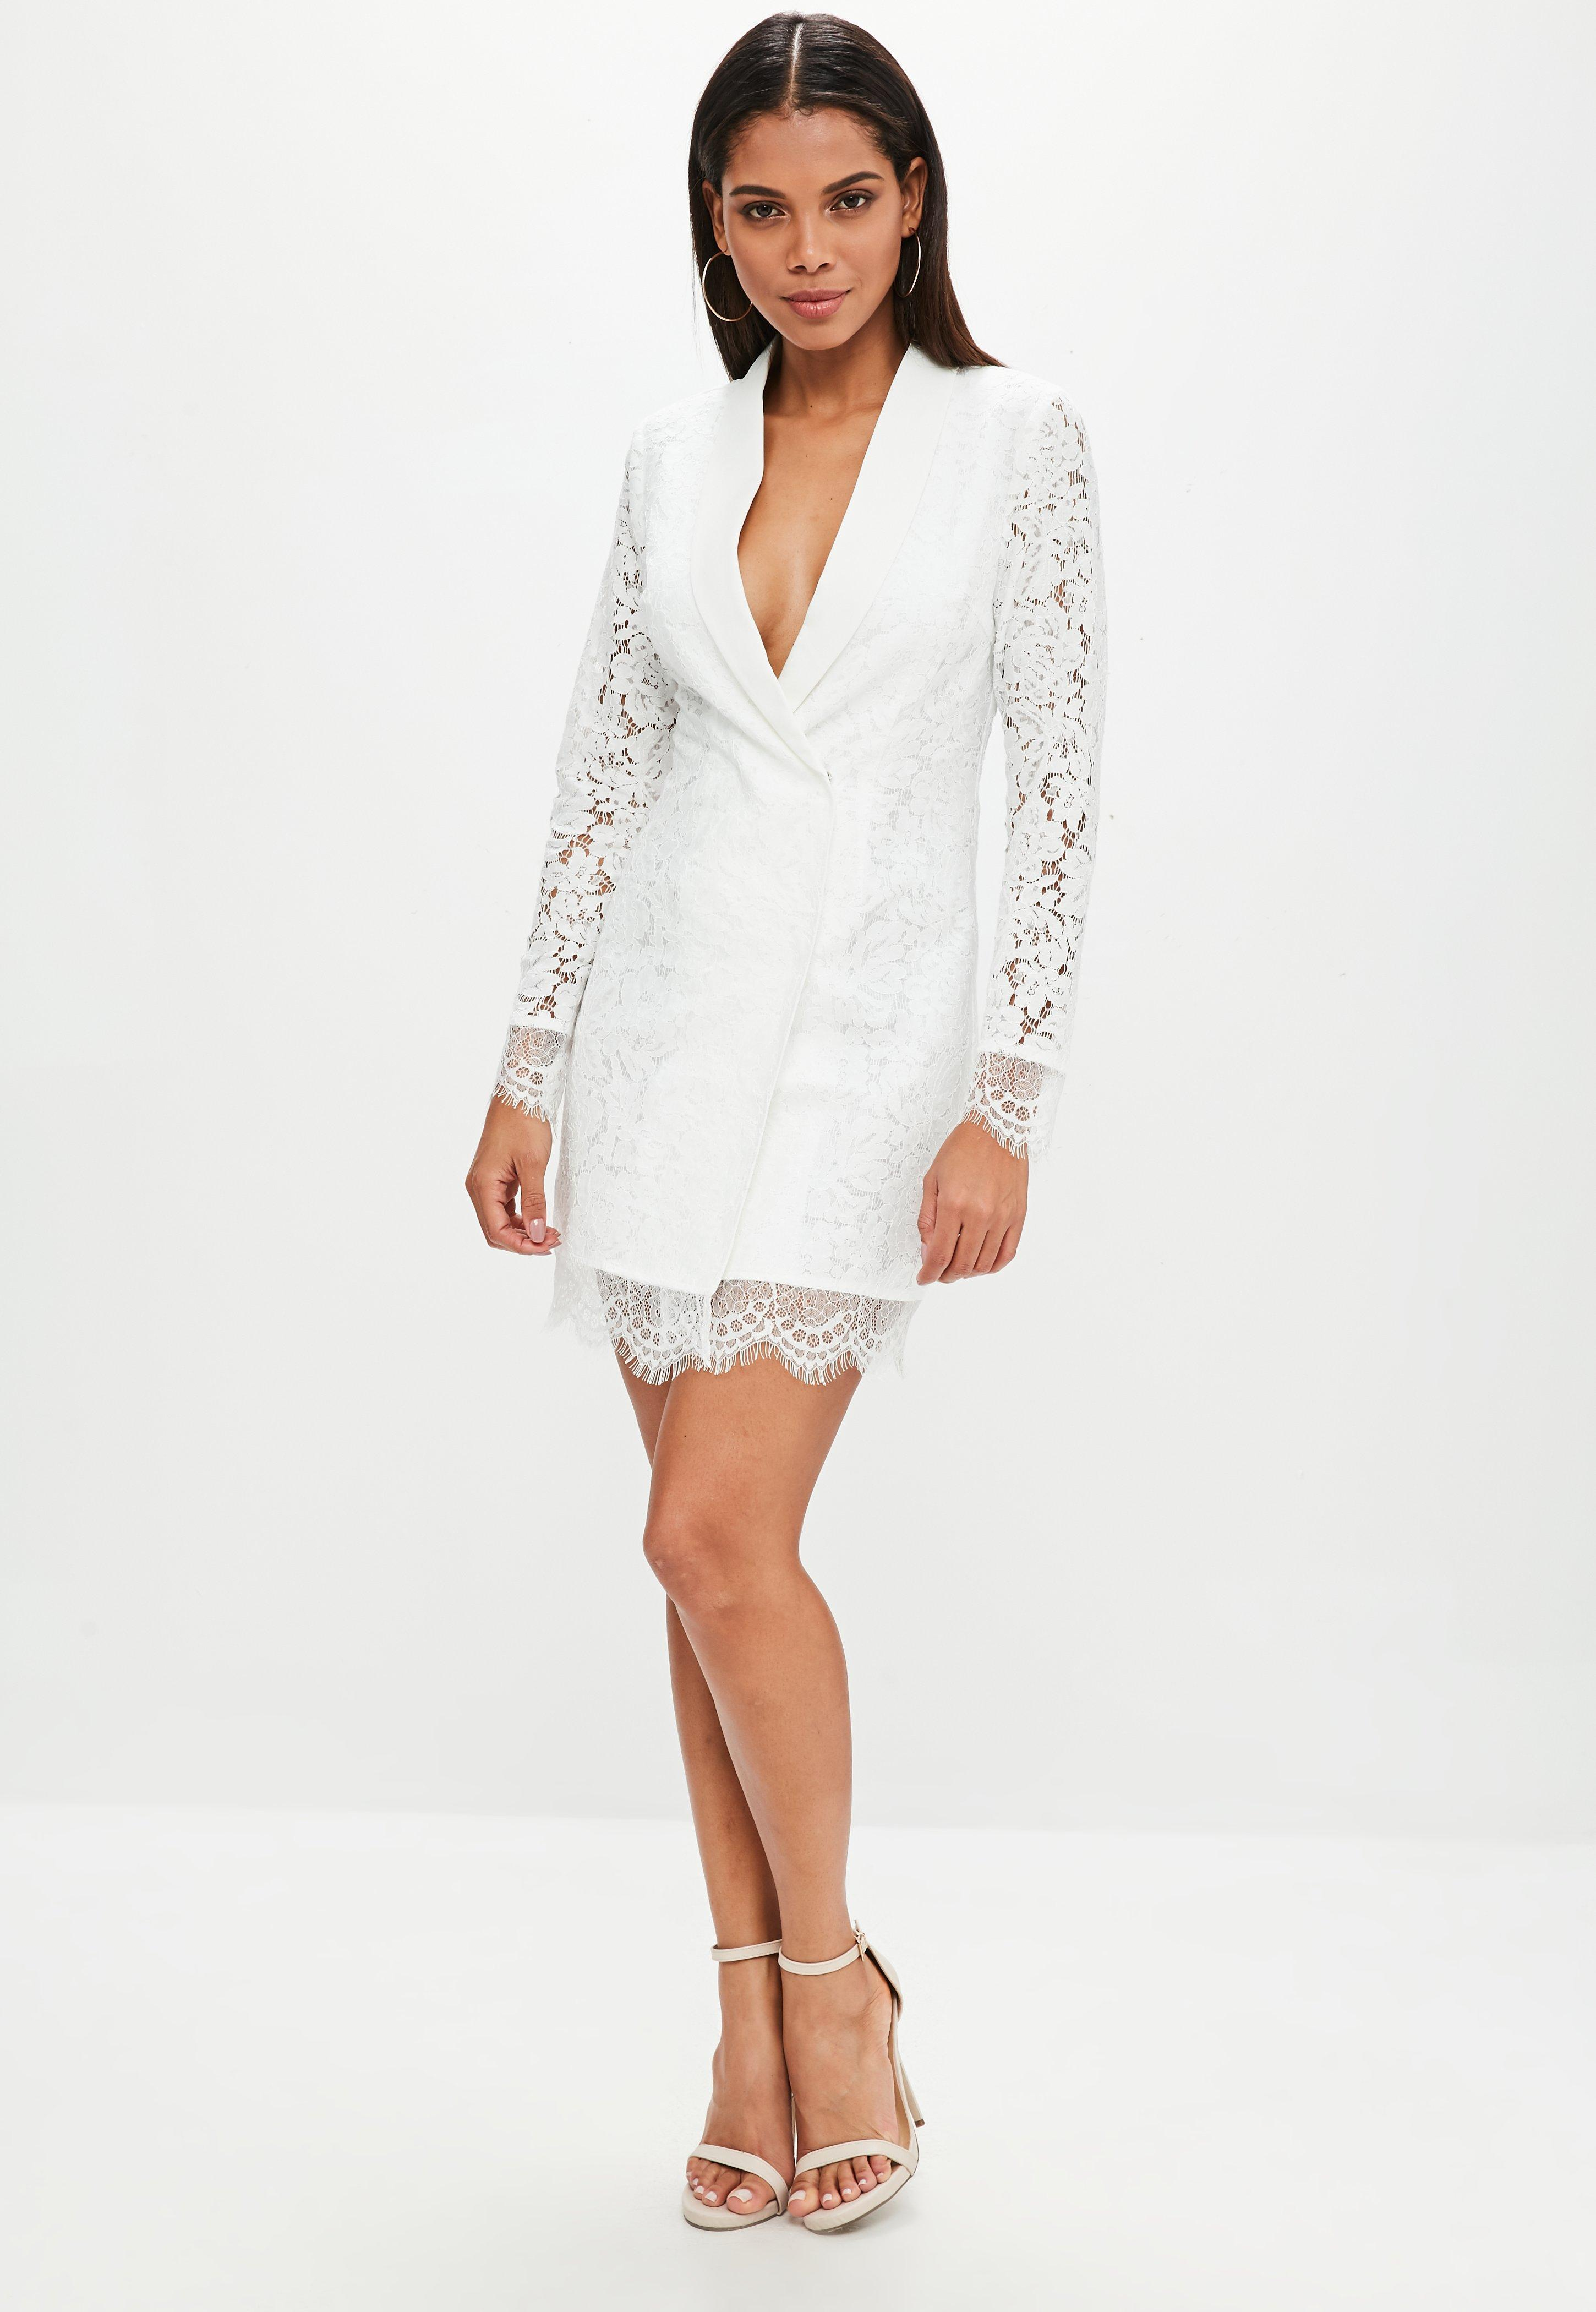 2e4e3502454d0 Lyst - Missguided White Lace Blazer Dress in White